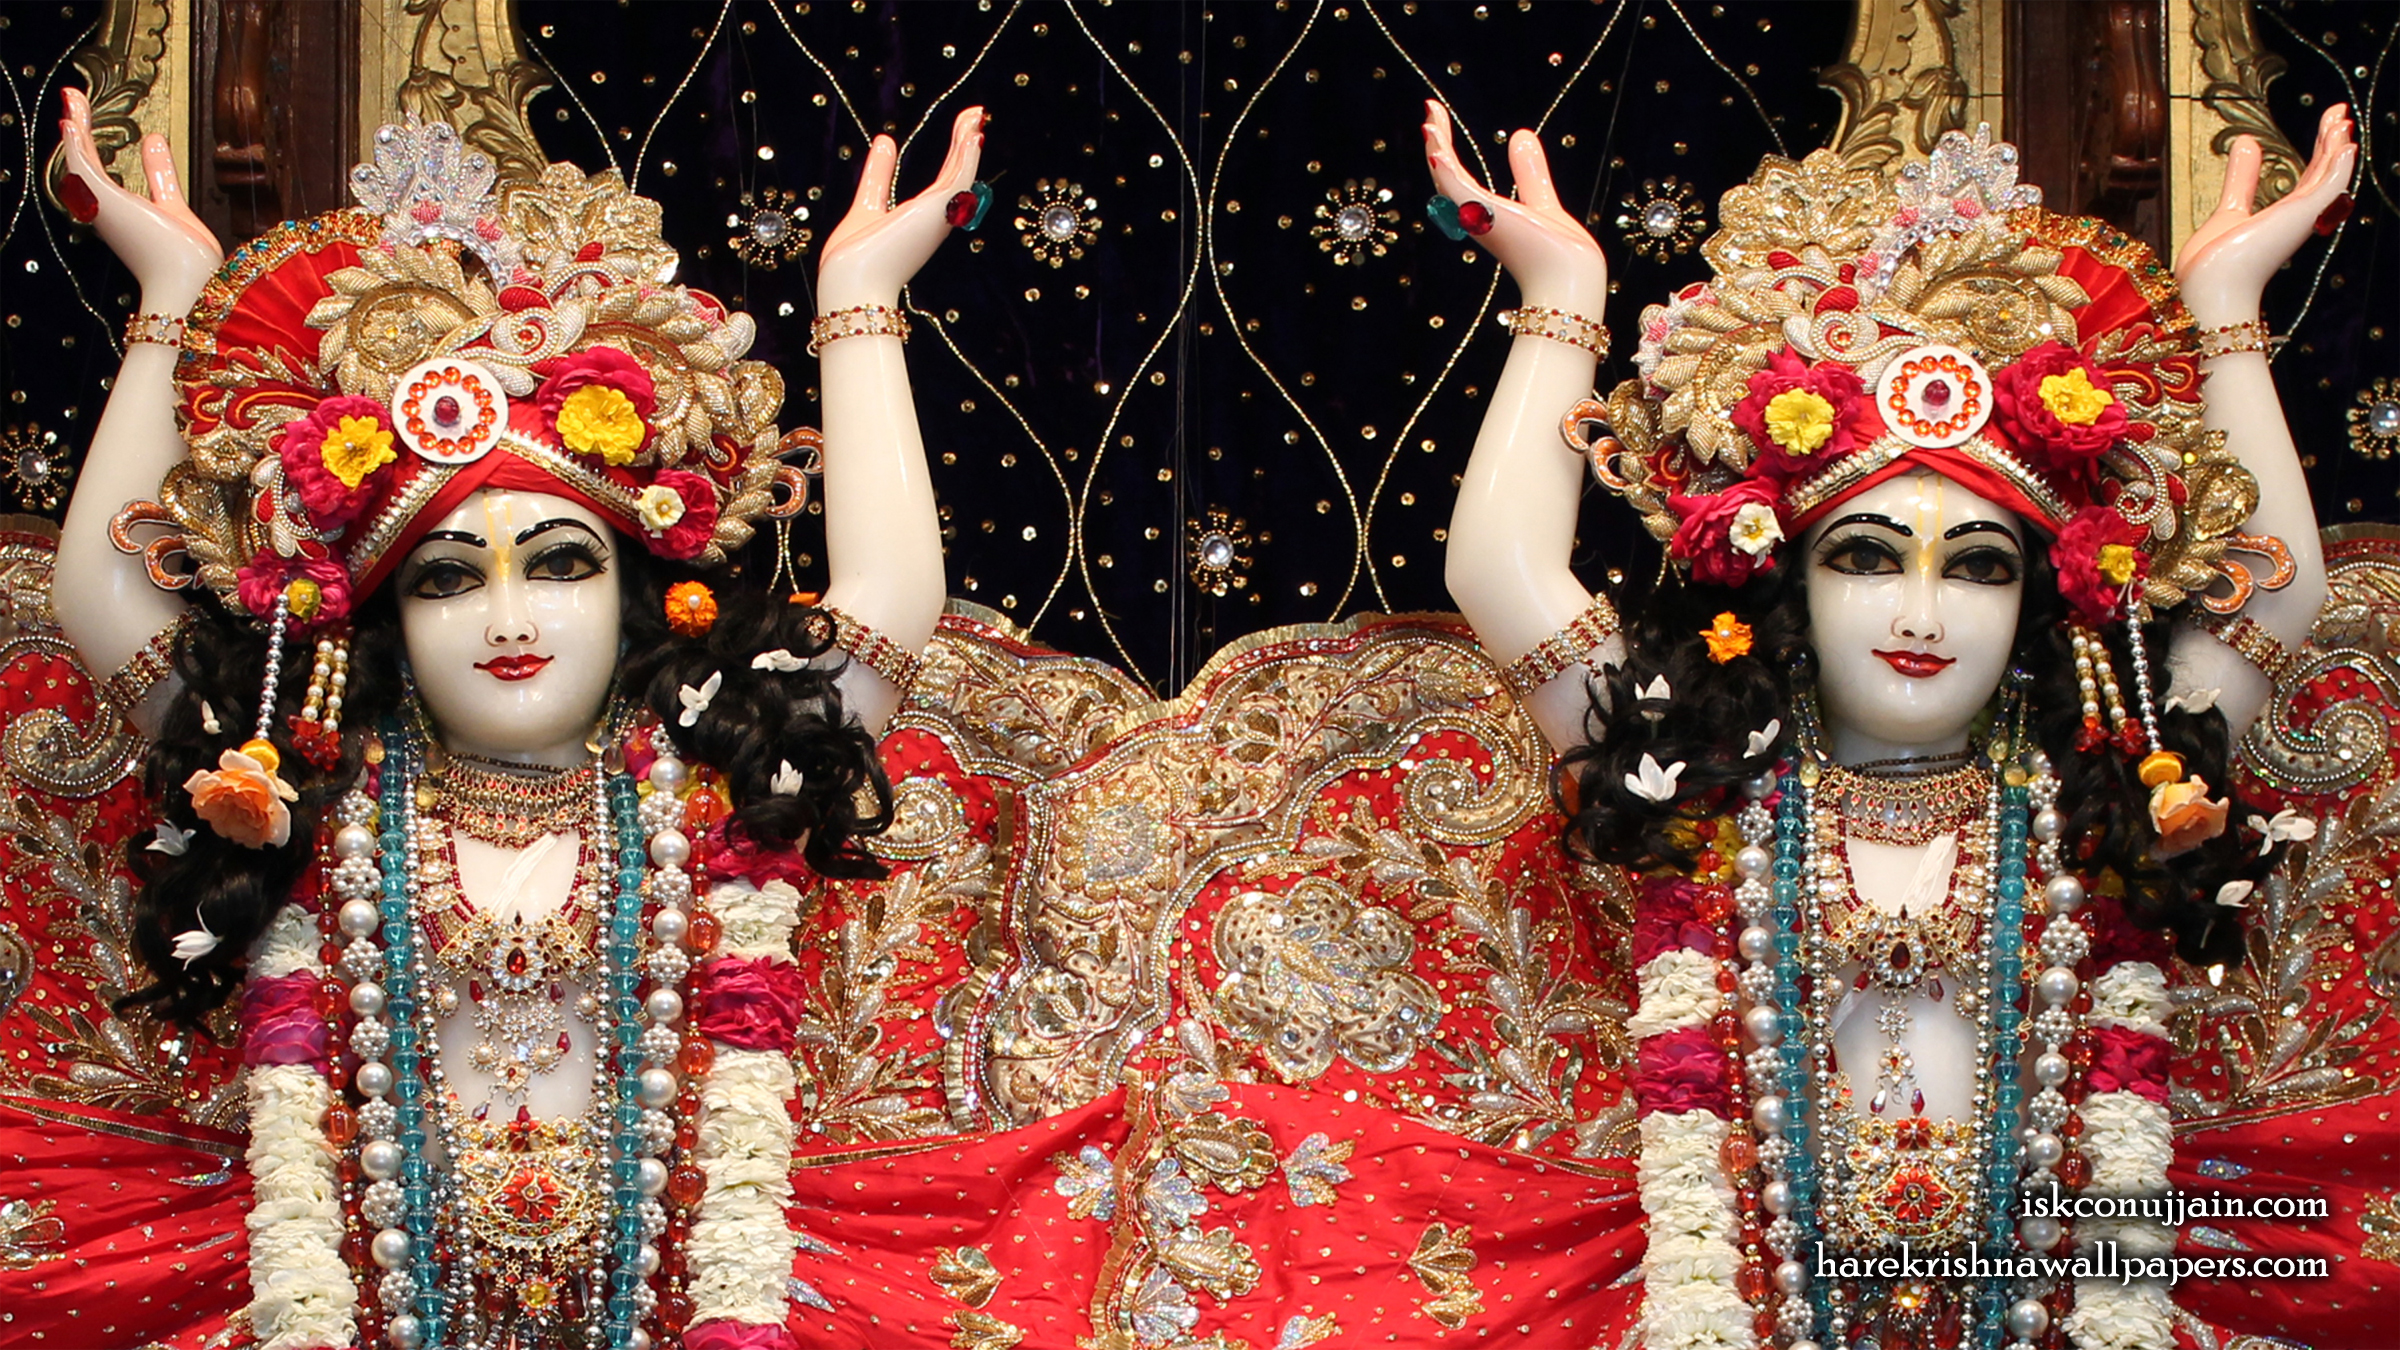 Sri Sri Gaura Nitai Close up Wallpaper (003) Size 2400x1350 Download